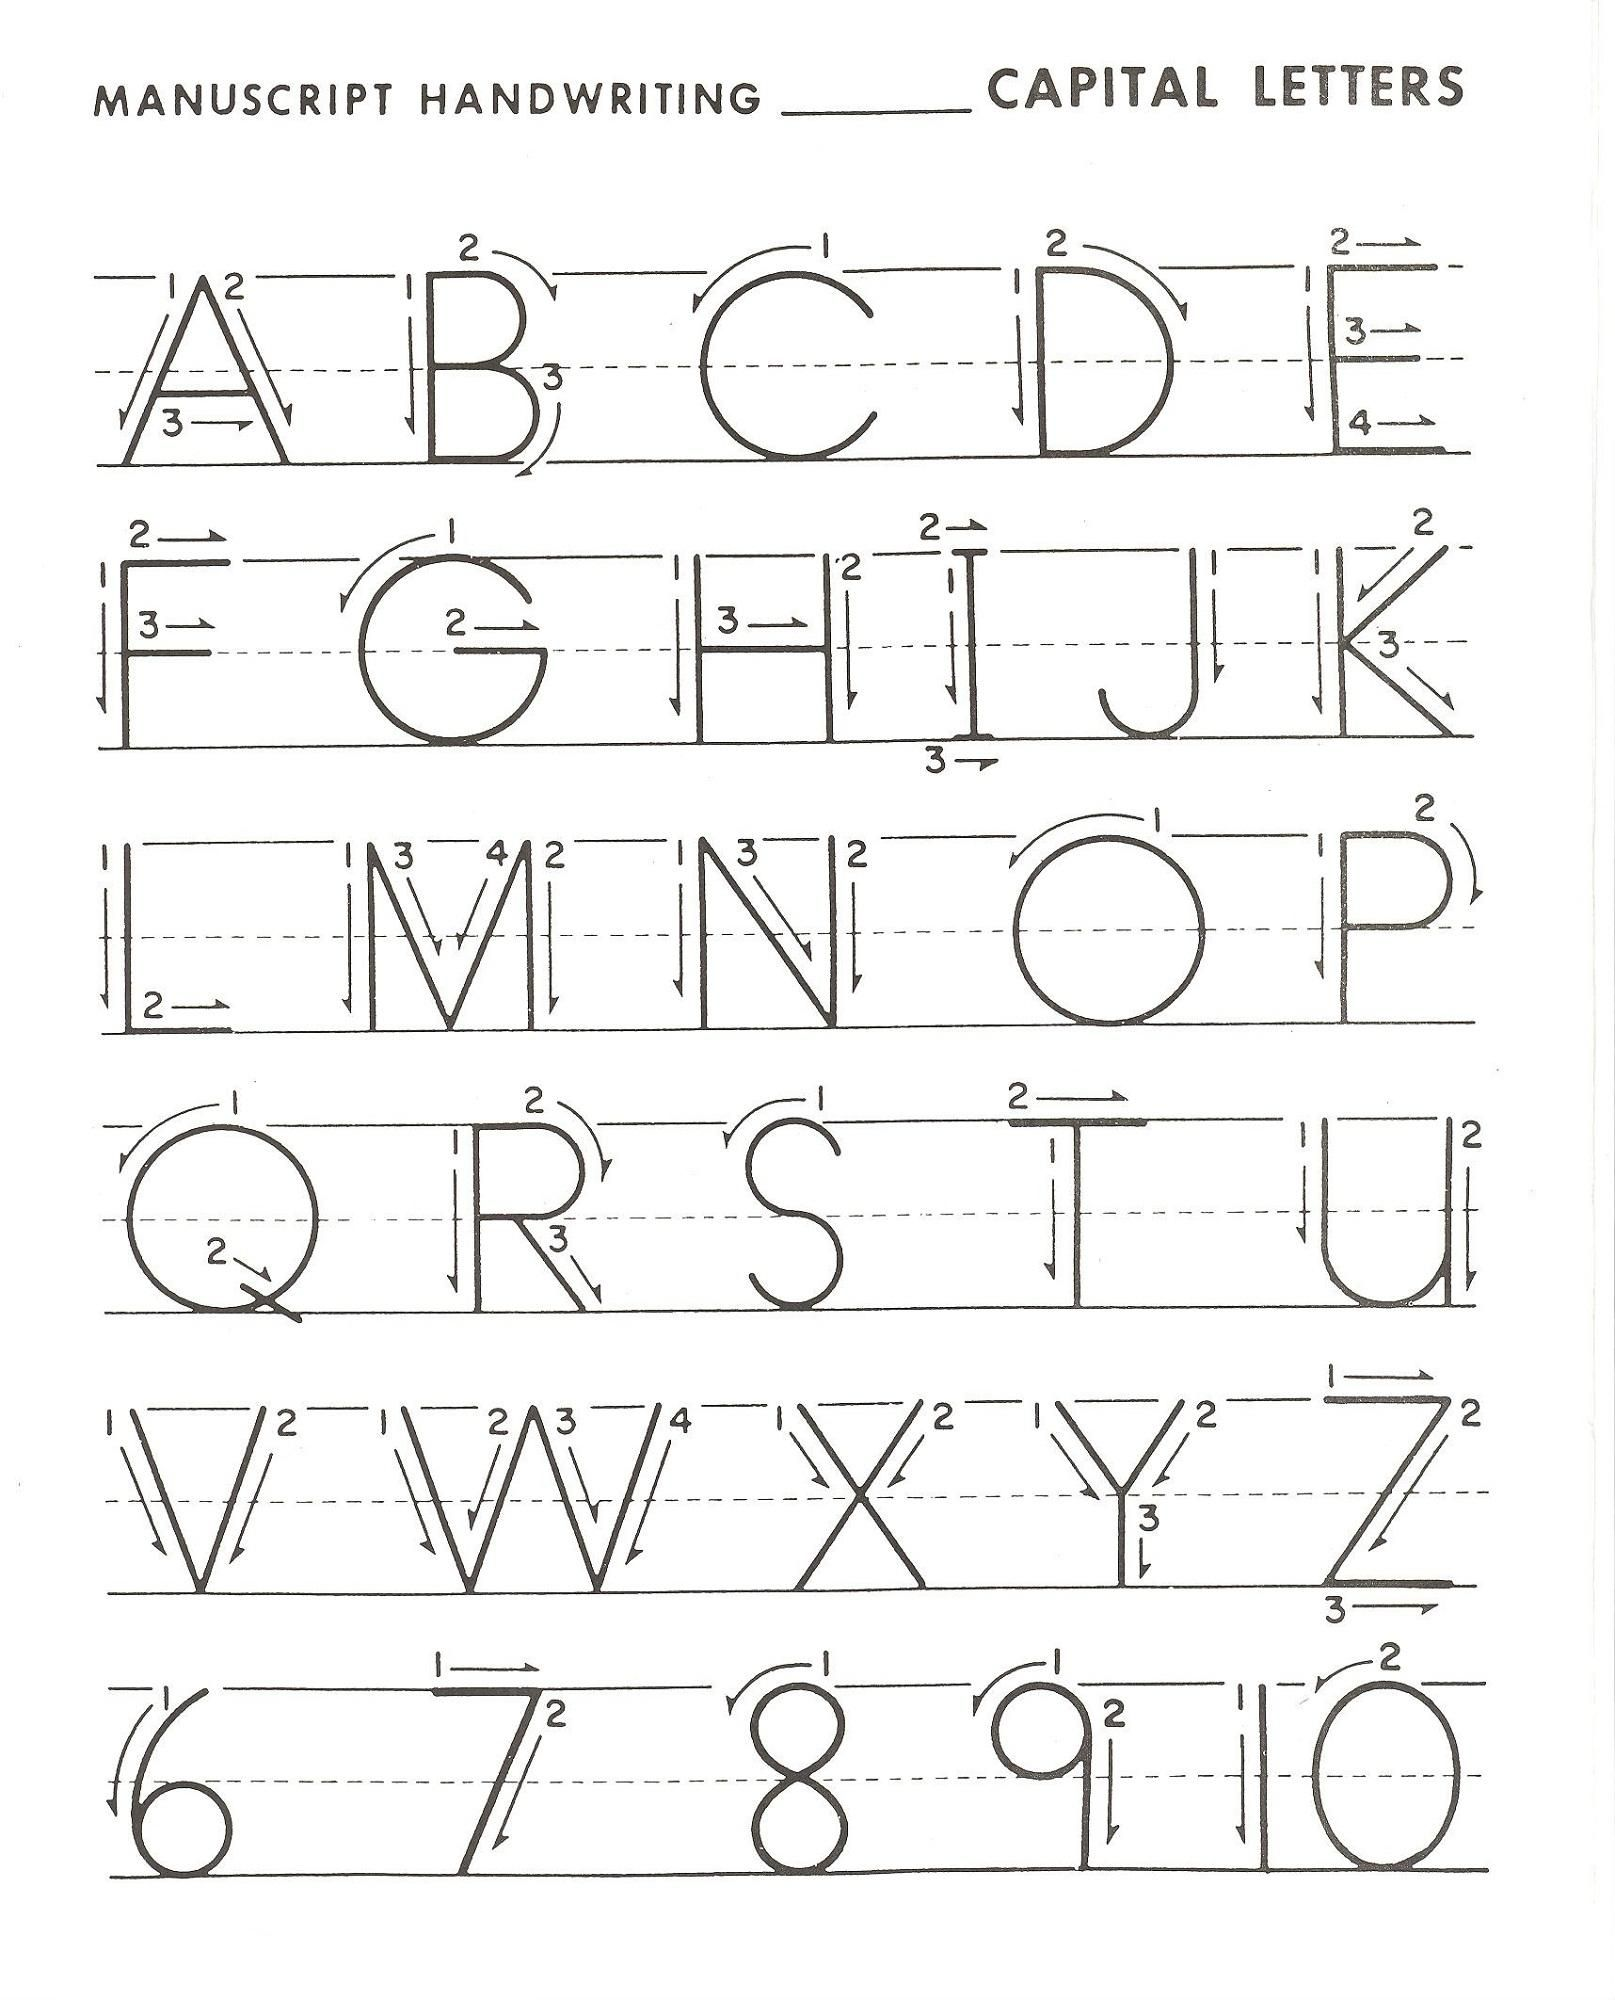 Writing Capital Letters Worksheet Letter Worksheets Alphabet Kindergarten Handwriting Worksheets For Kindergarten [ 2000 x 1615 Pixel ]